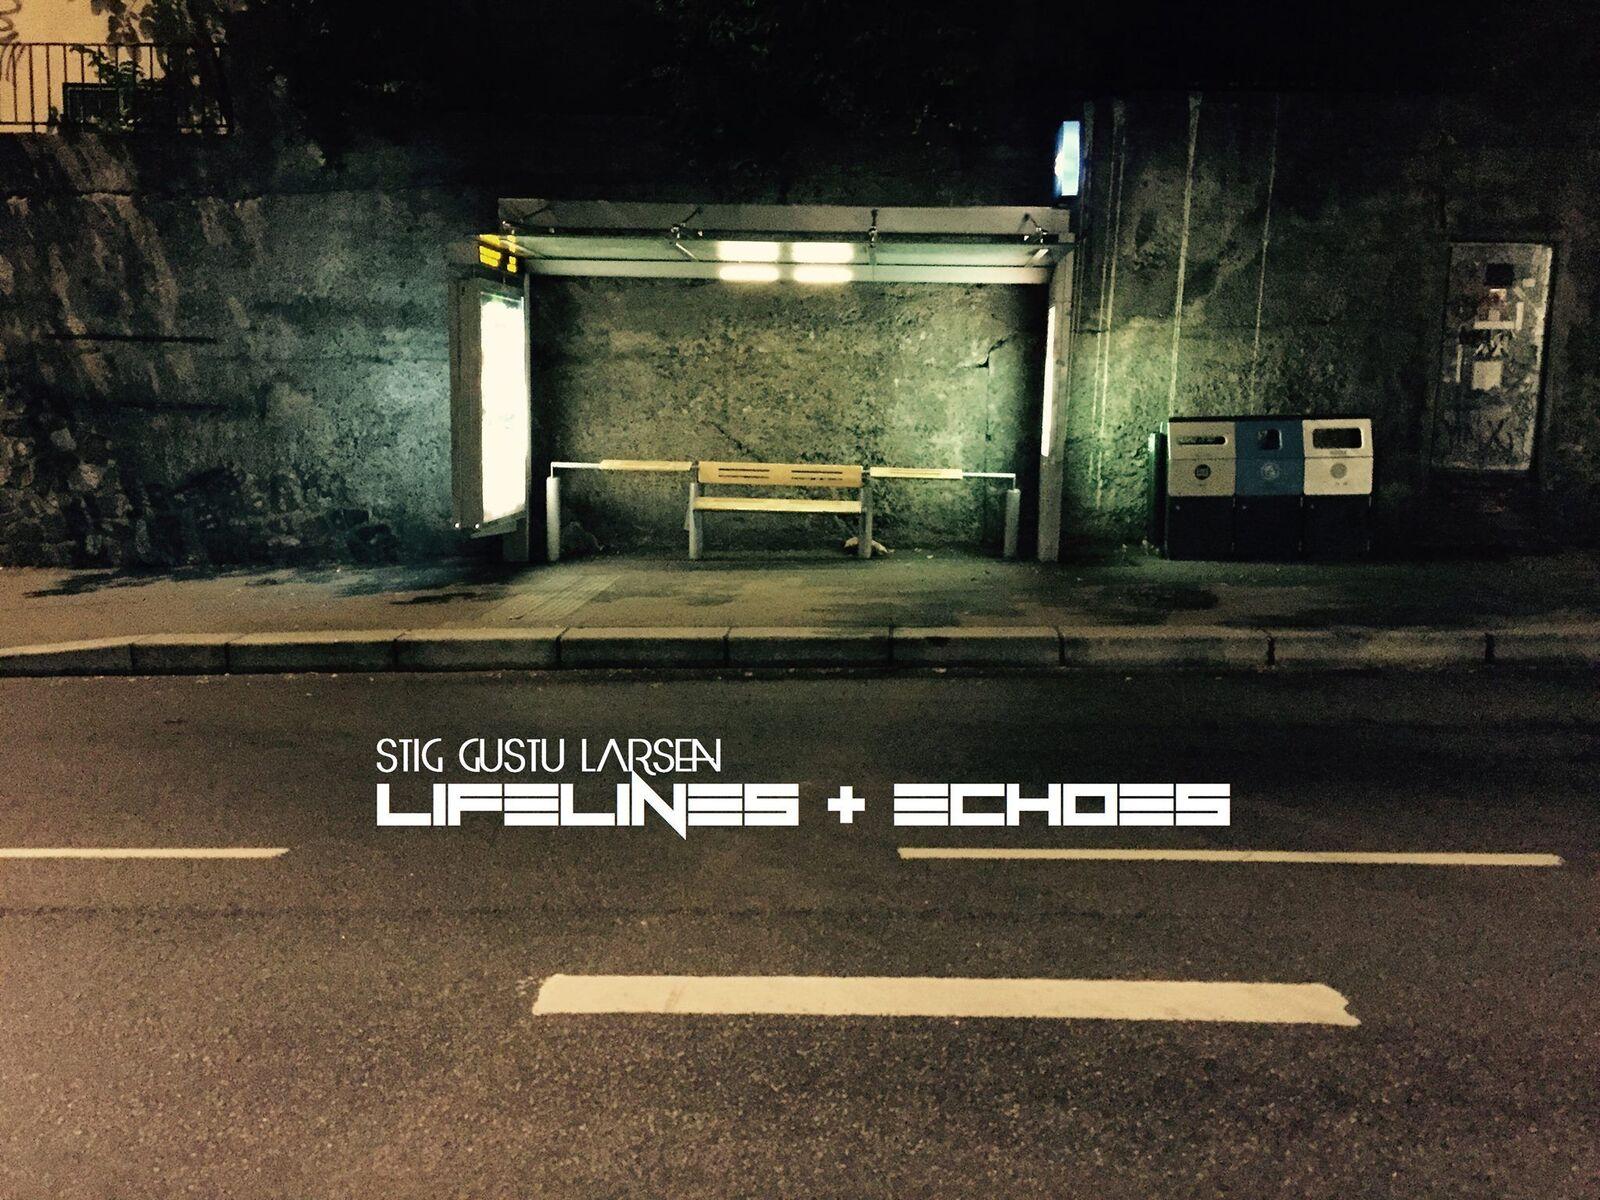 Stig Gustu Larsen – Lifelines + Echoes